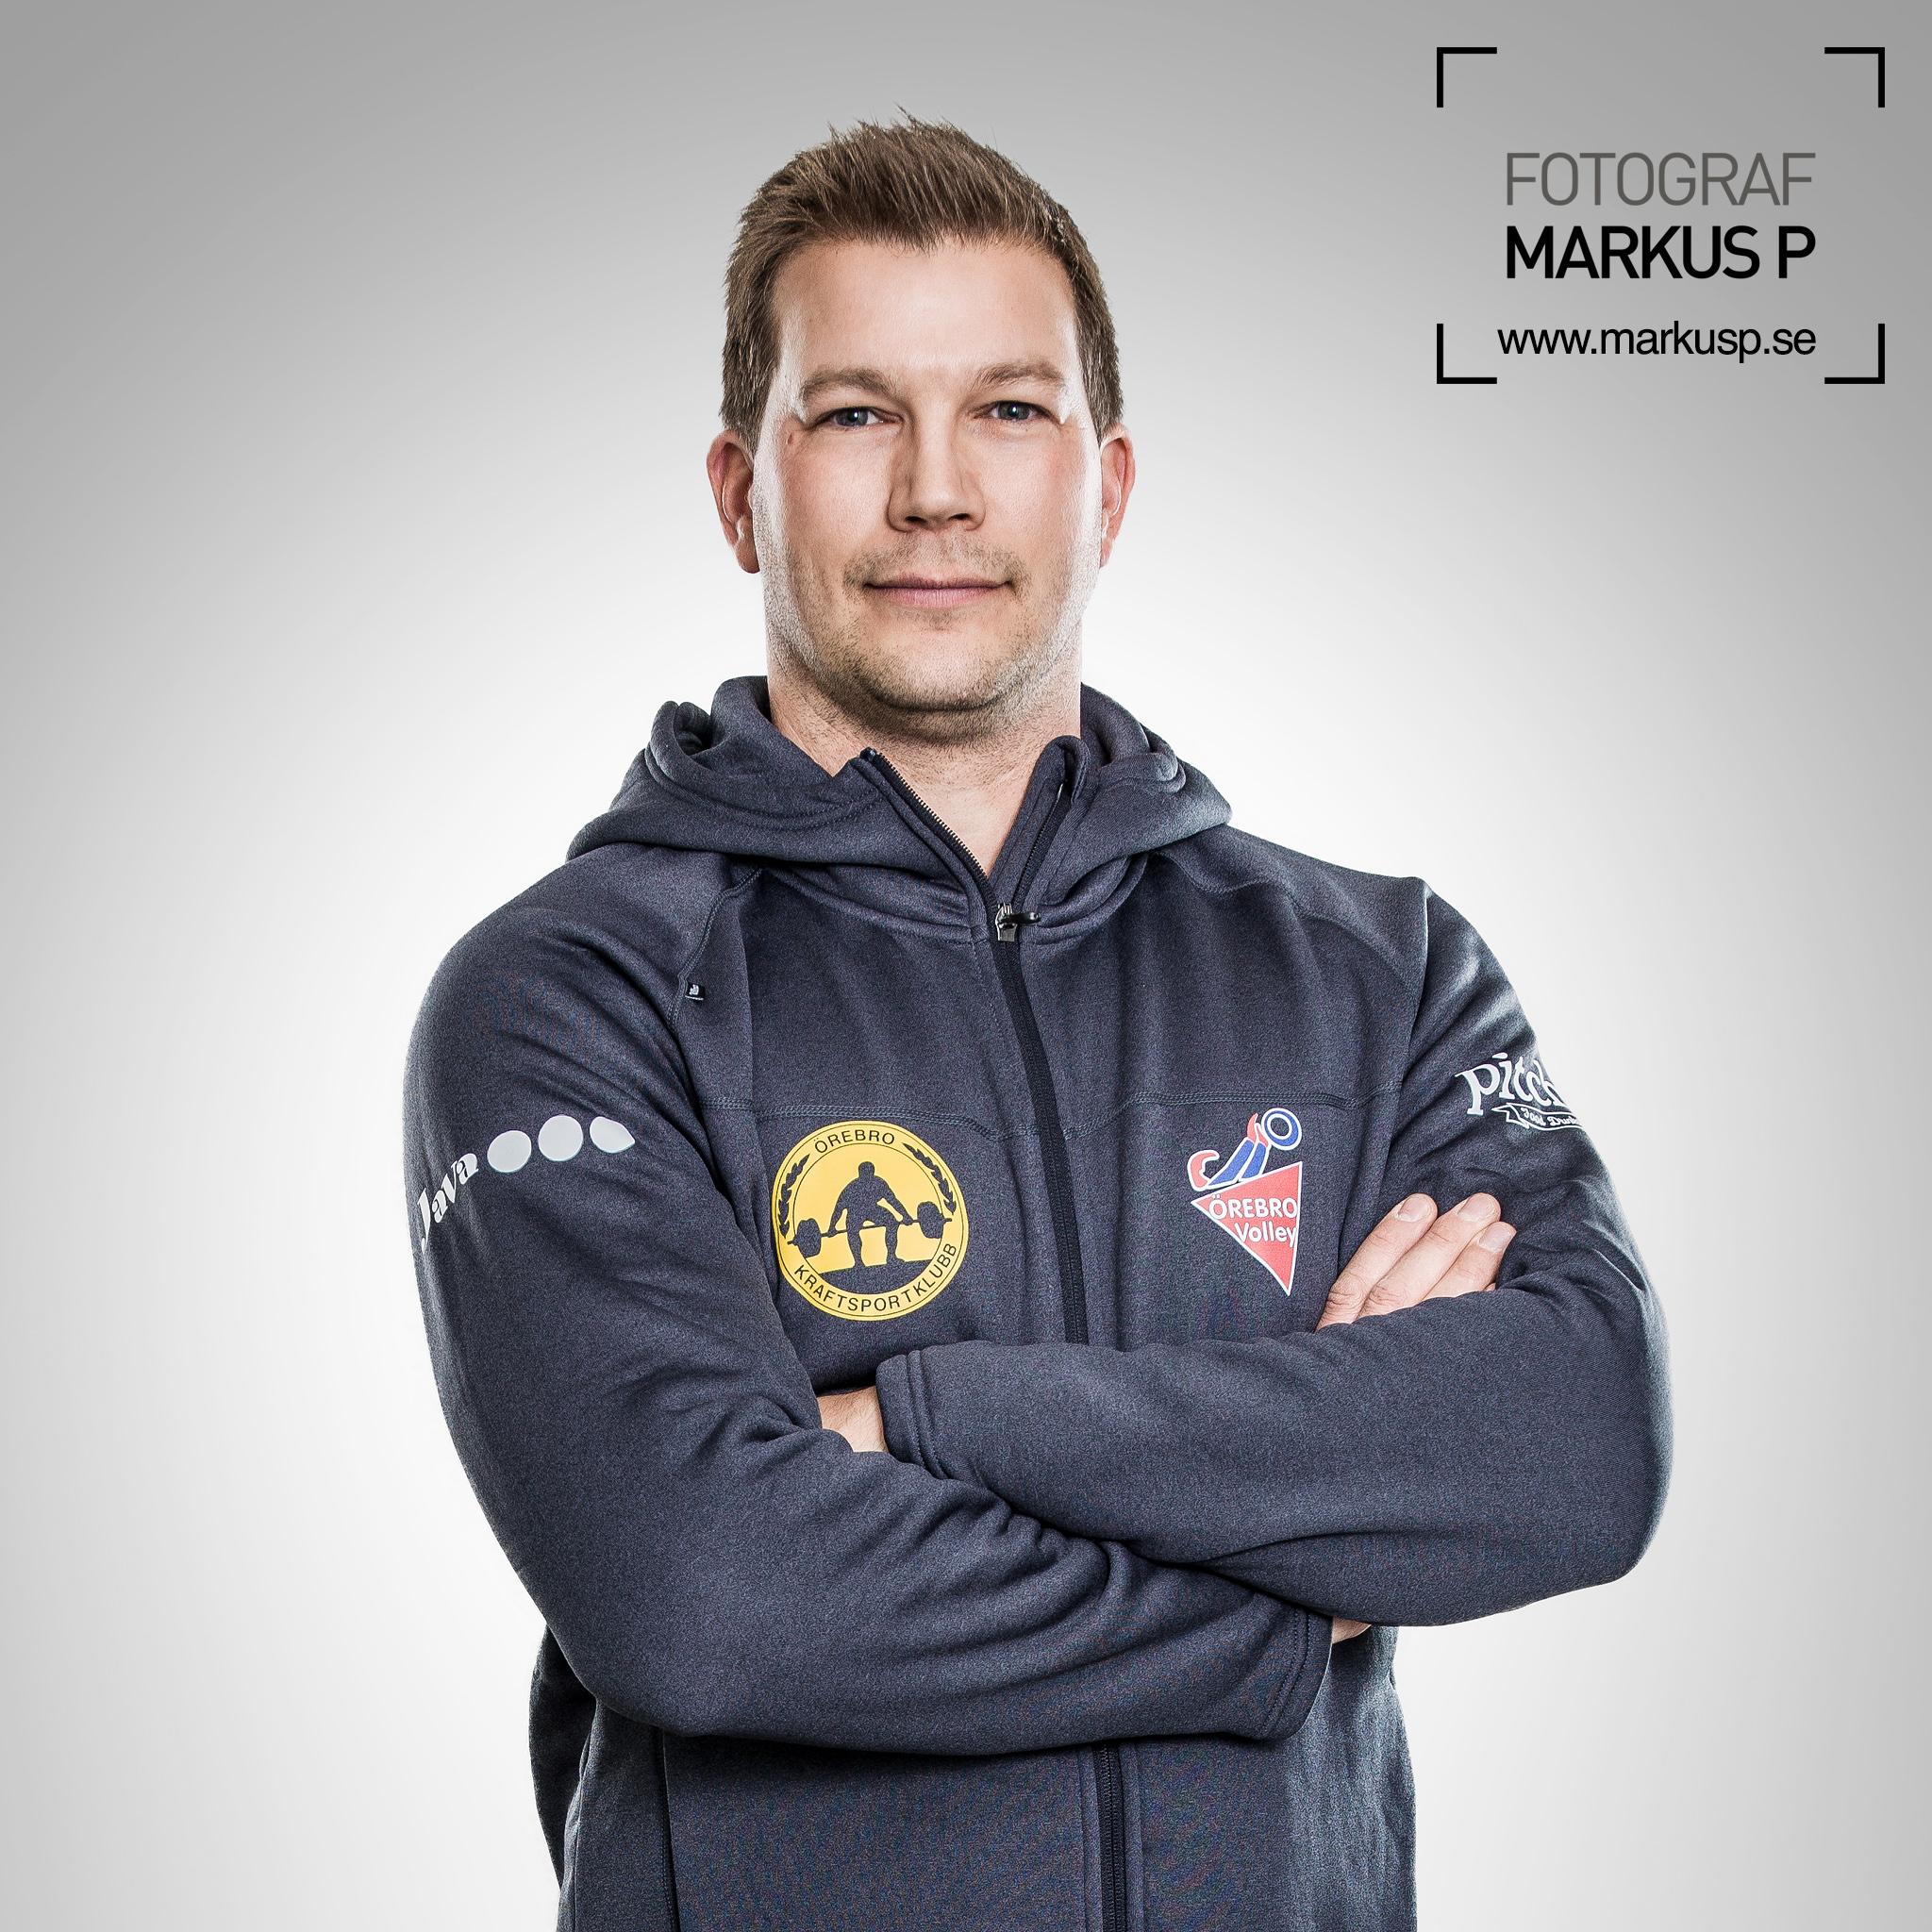 Coacher ÖKK, porträttbilder. Fotograf Markus P i Örebro.